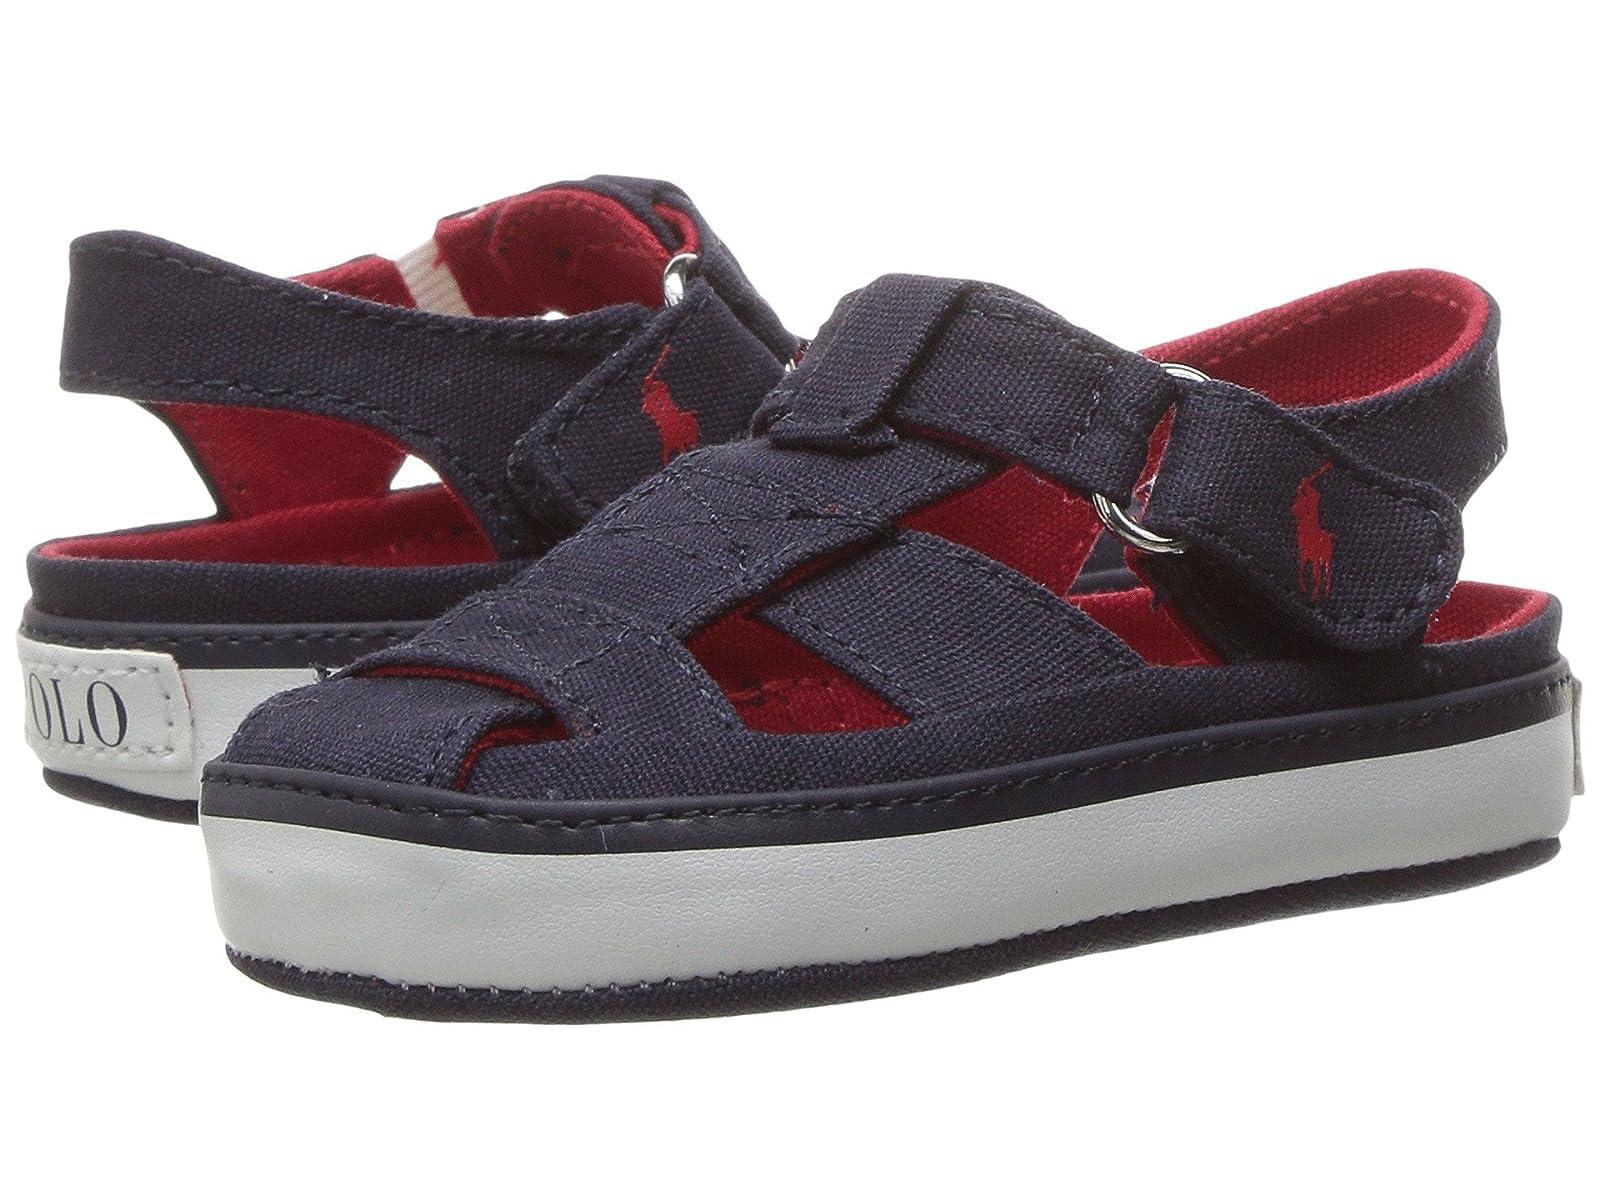 Polo Ralph Lauren Kids Sander Fisherman II (Infant)Atmospheric grades have affordable shoes